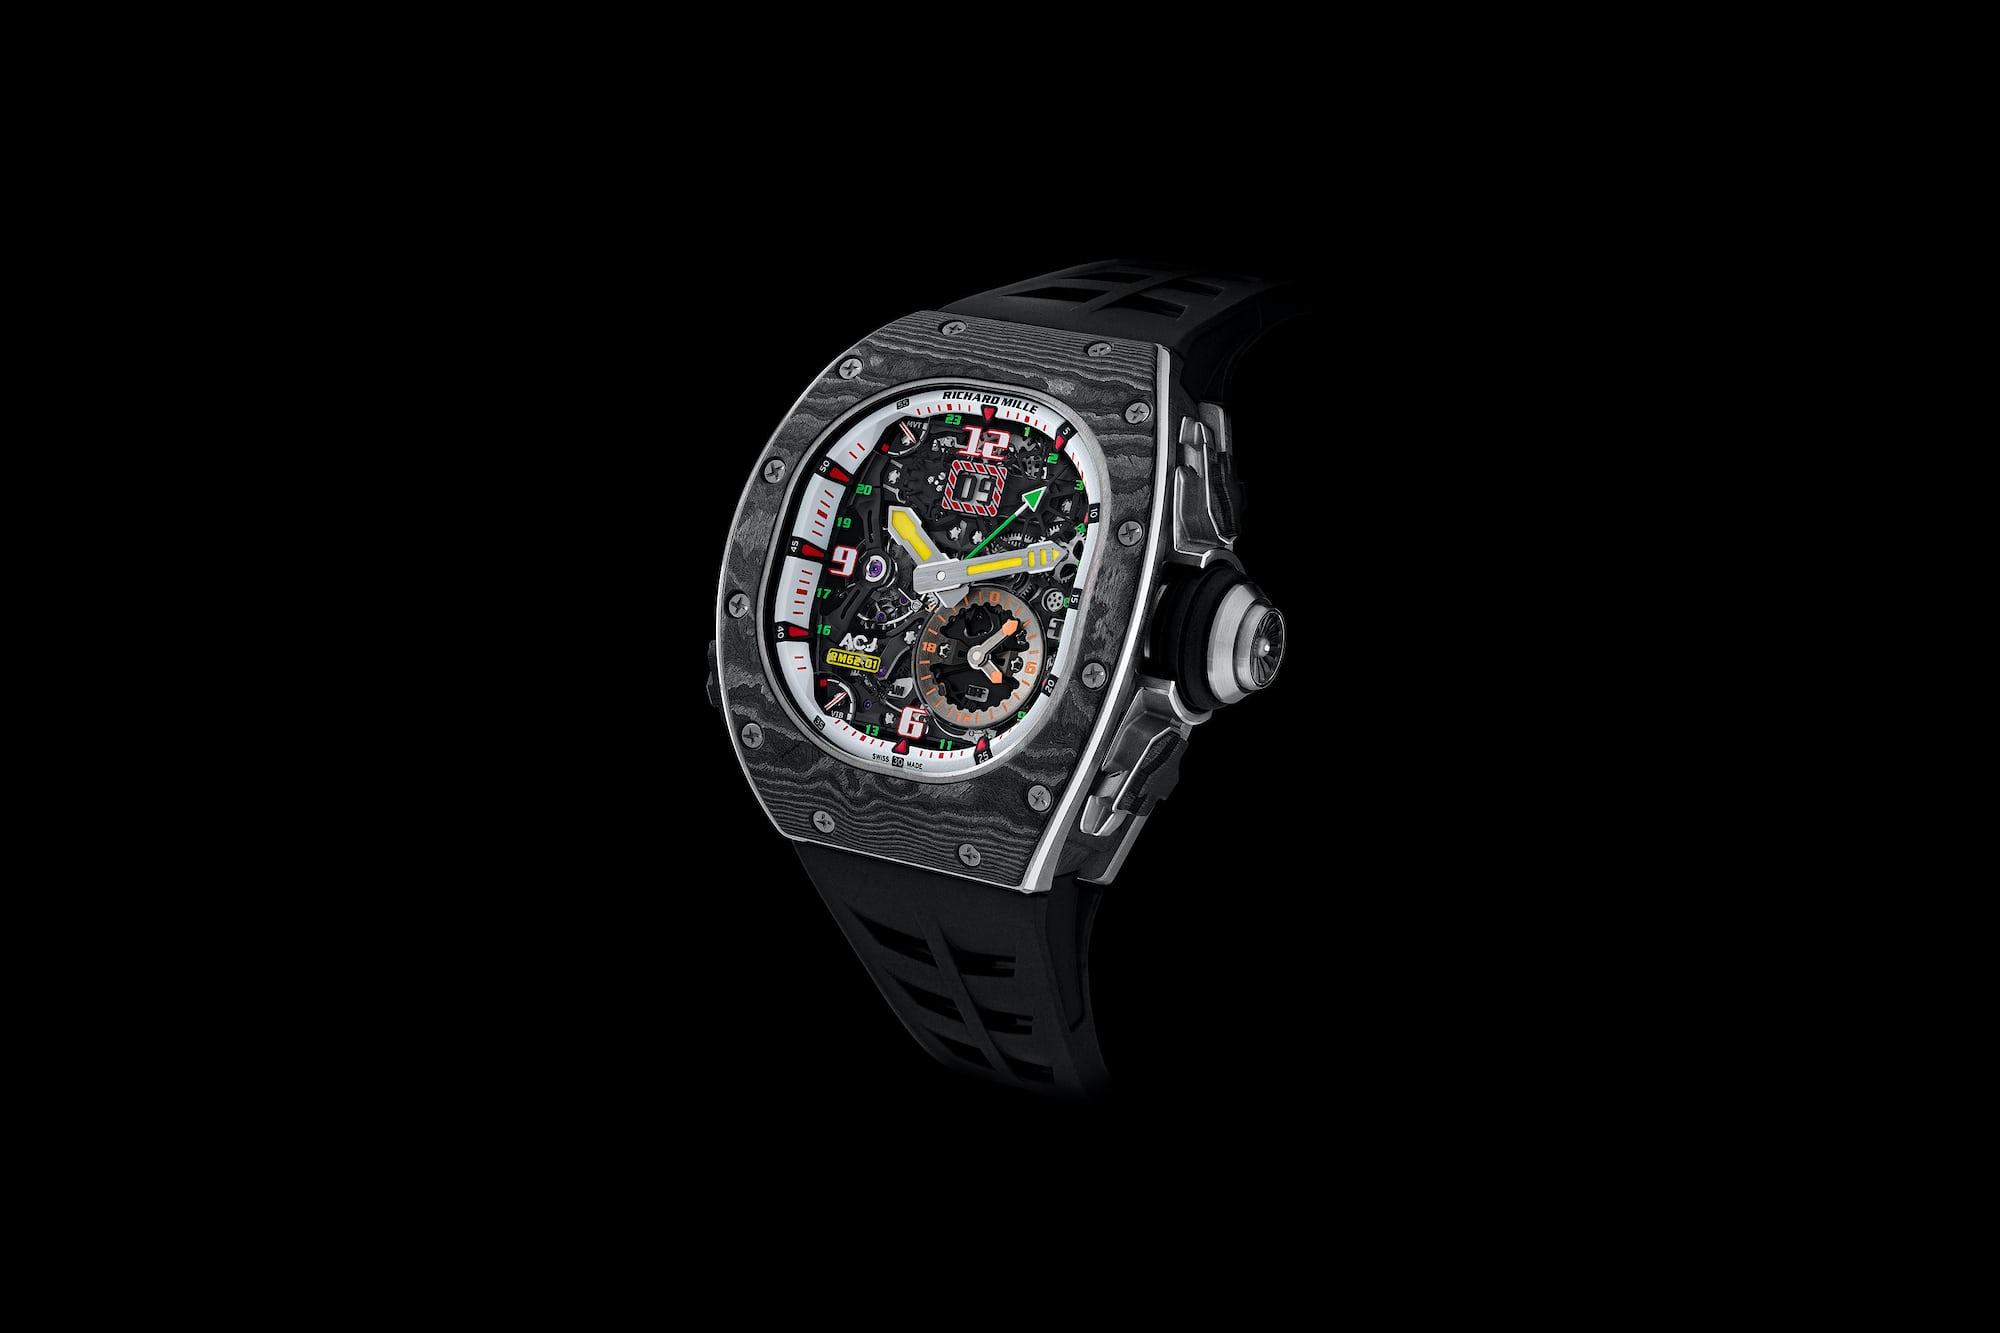 Introducing: The Richard Mille RM 62-01 Tourbillon Vibrating Alarm